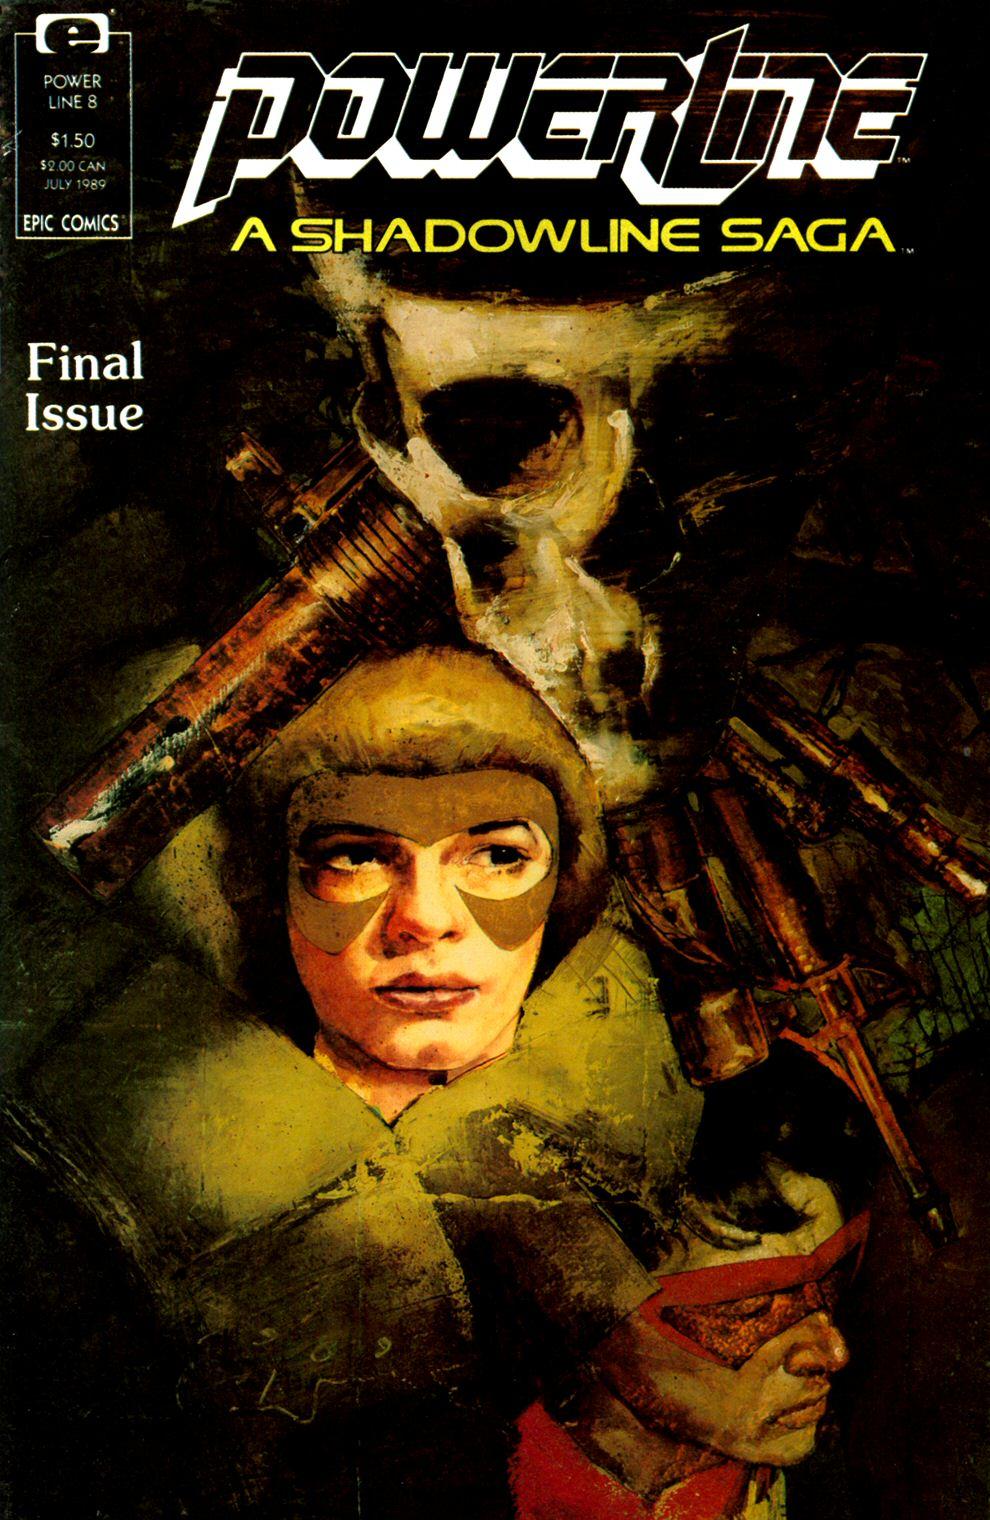 Read online Powerline comic -  Issue #8 - 1